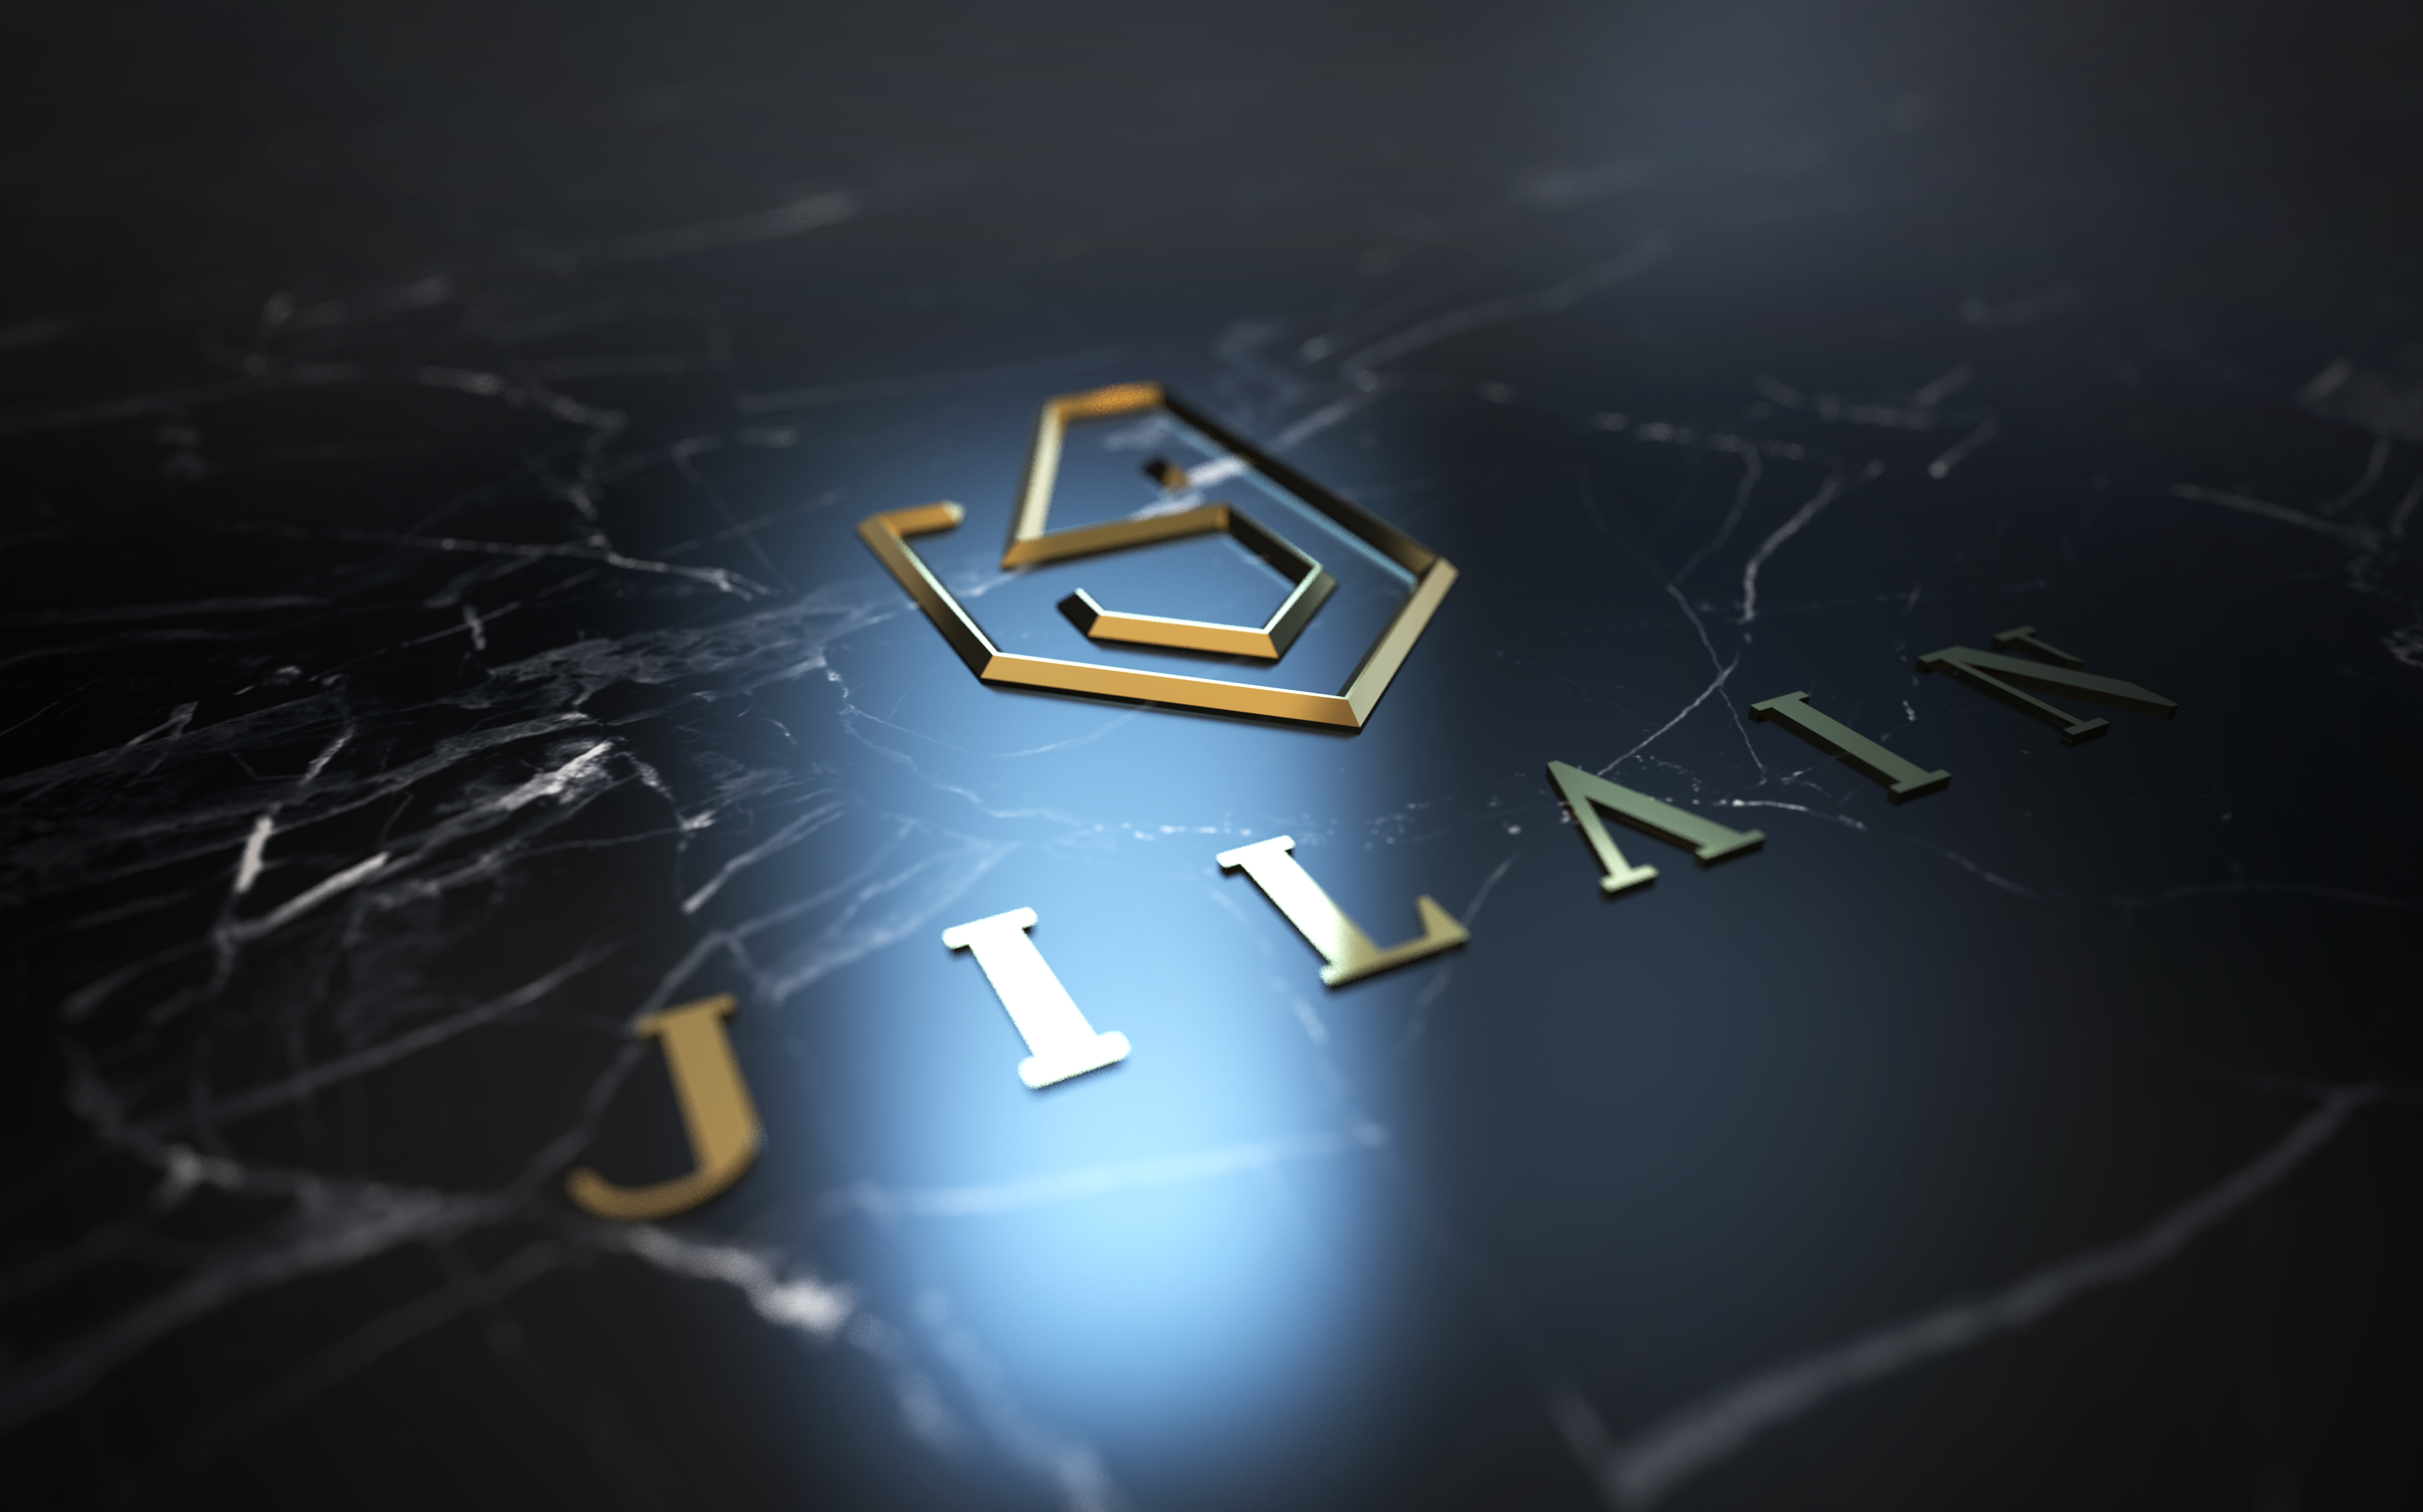 Product Reflex Jilain render